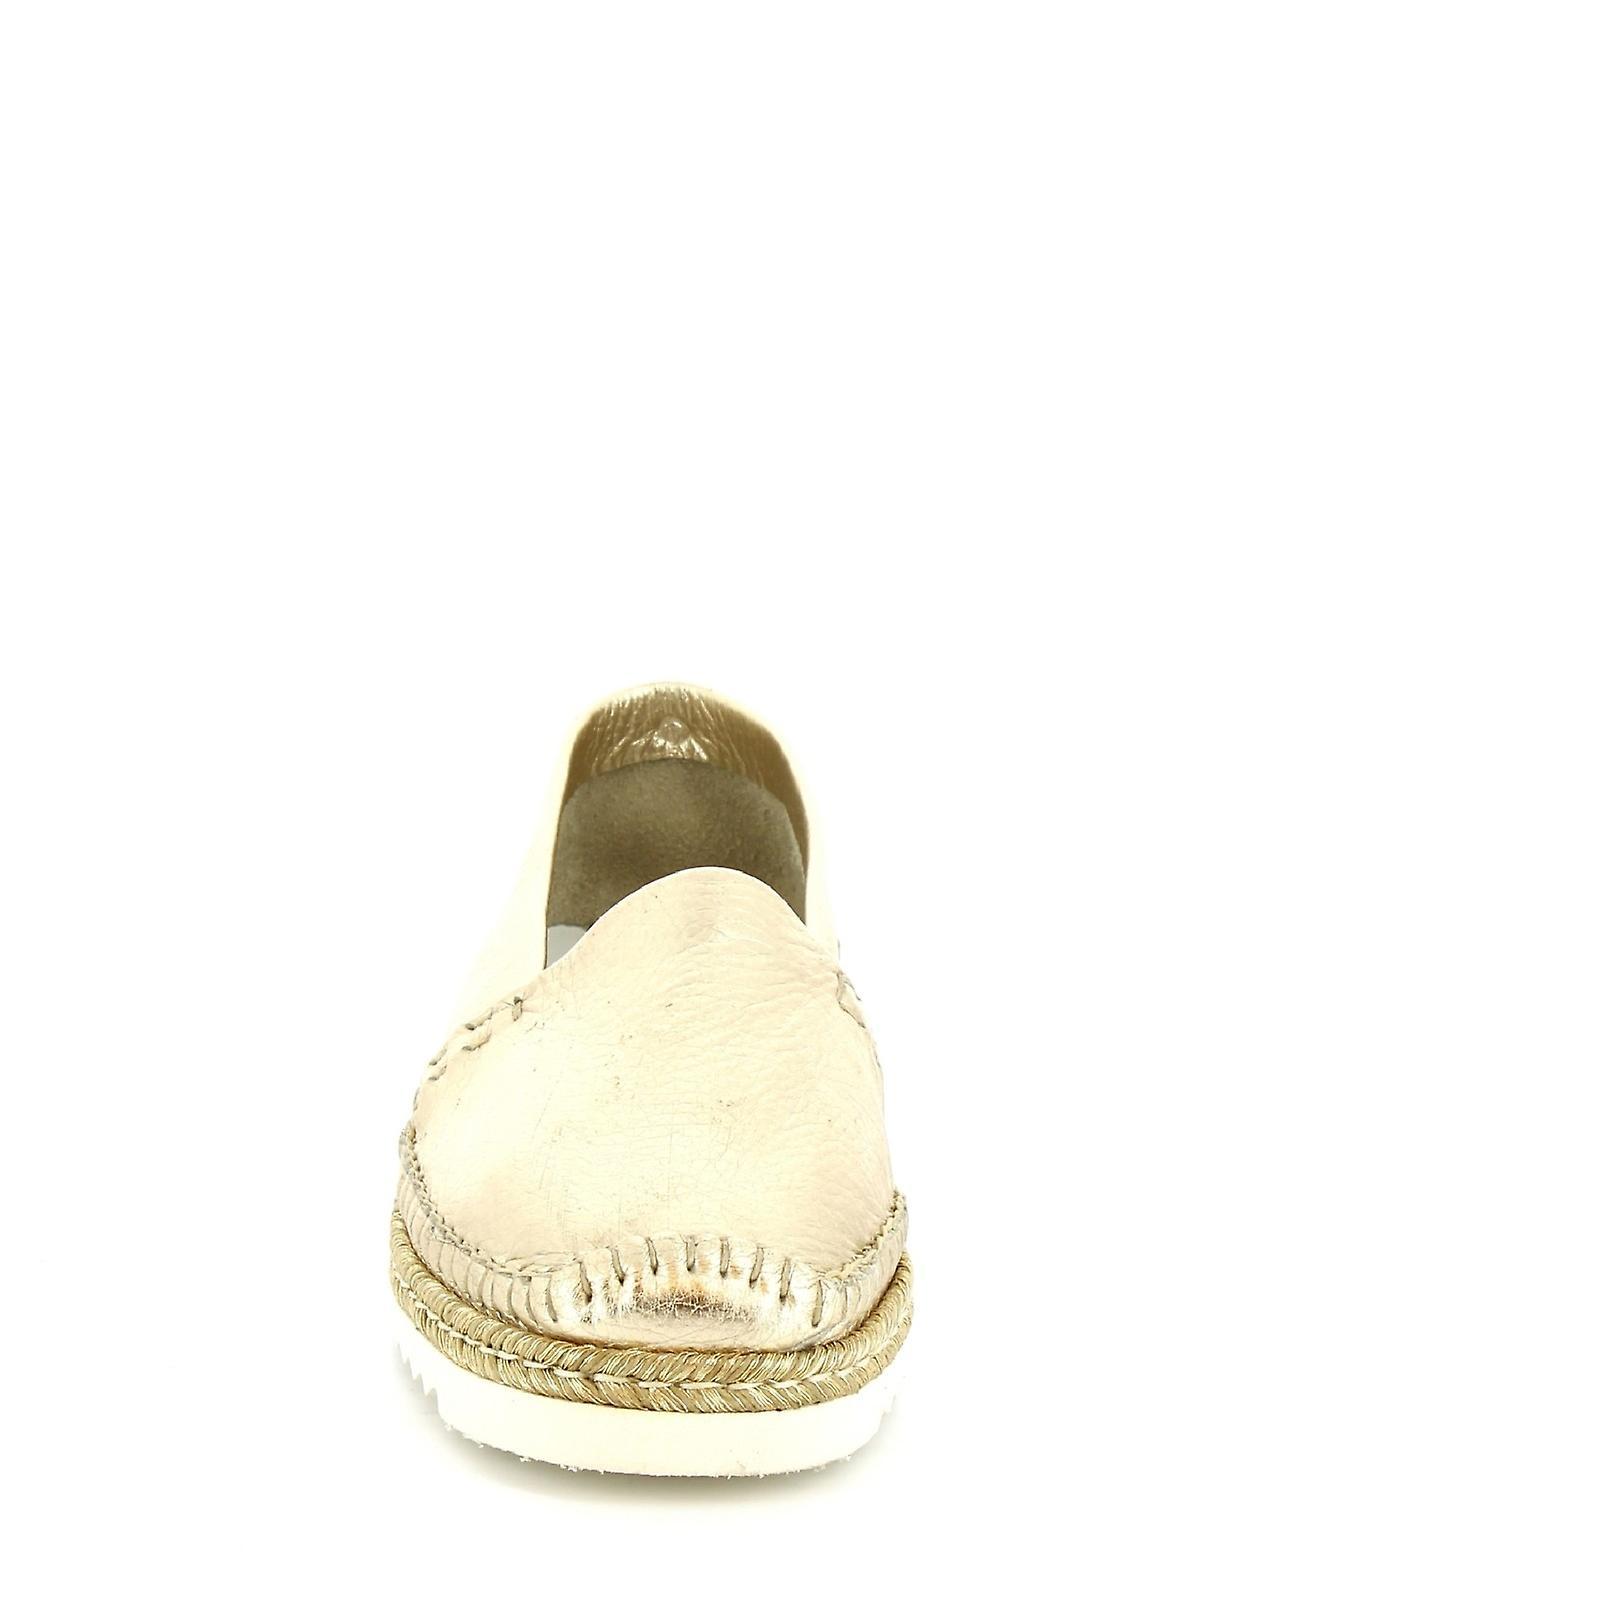 Leonardo Shoes Women's handmade slip-on loafers in pearl gold calf leather